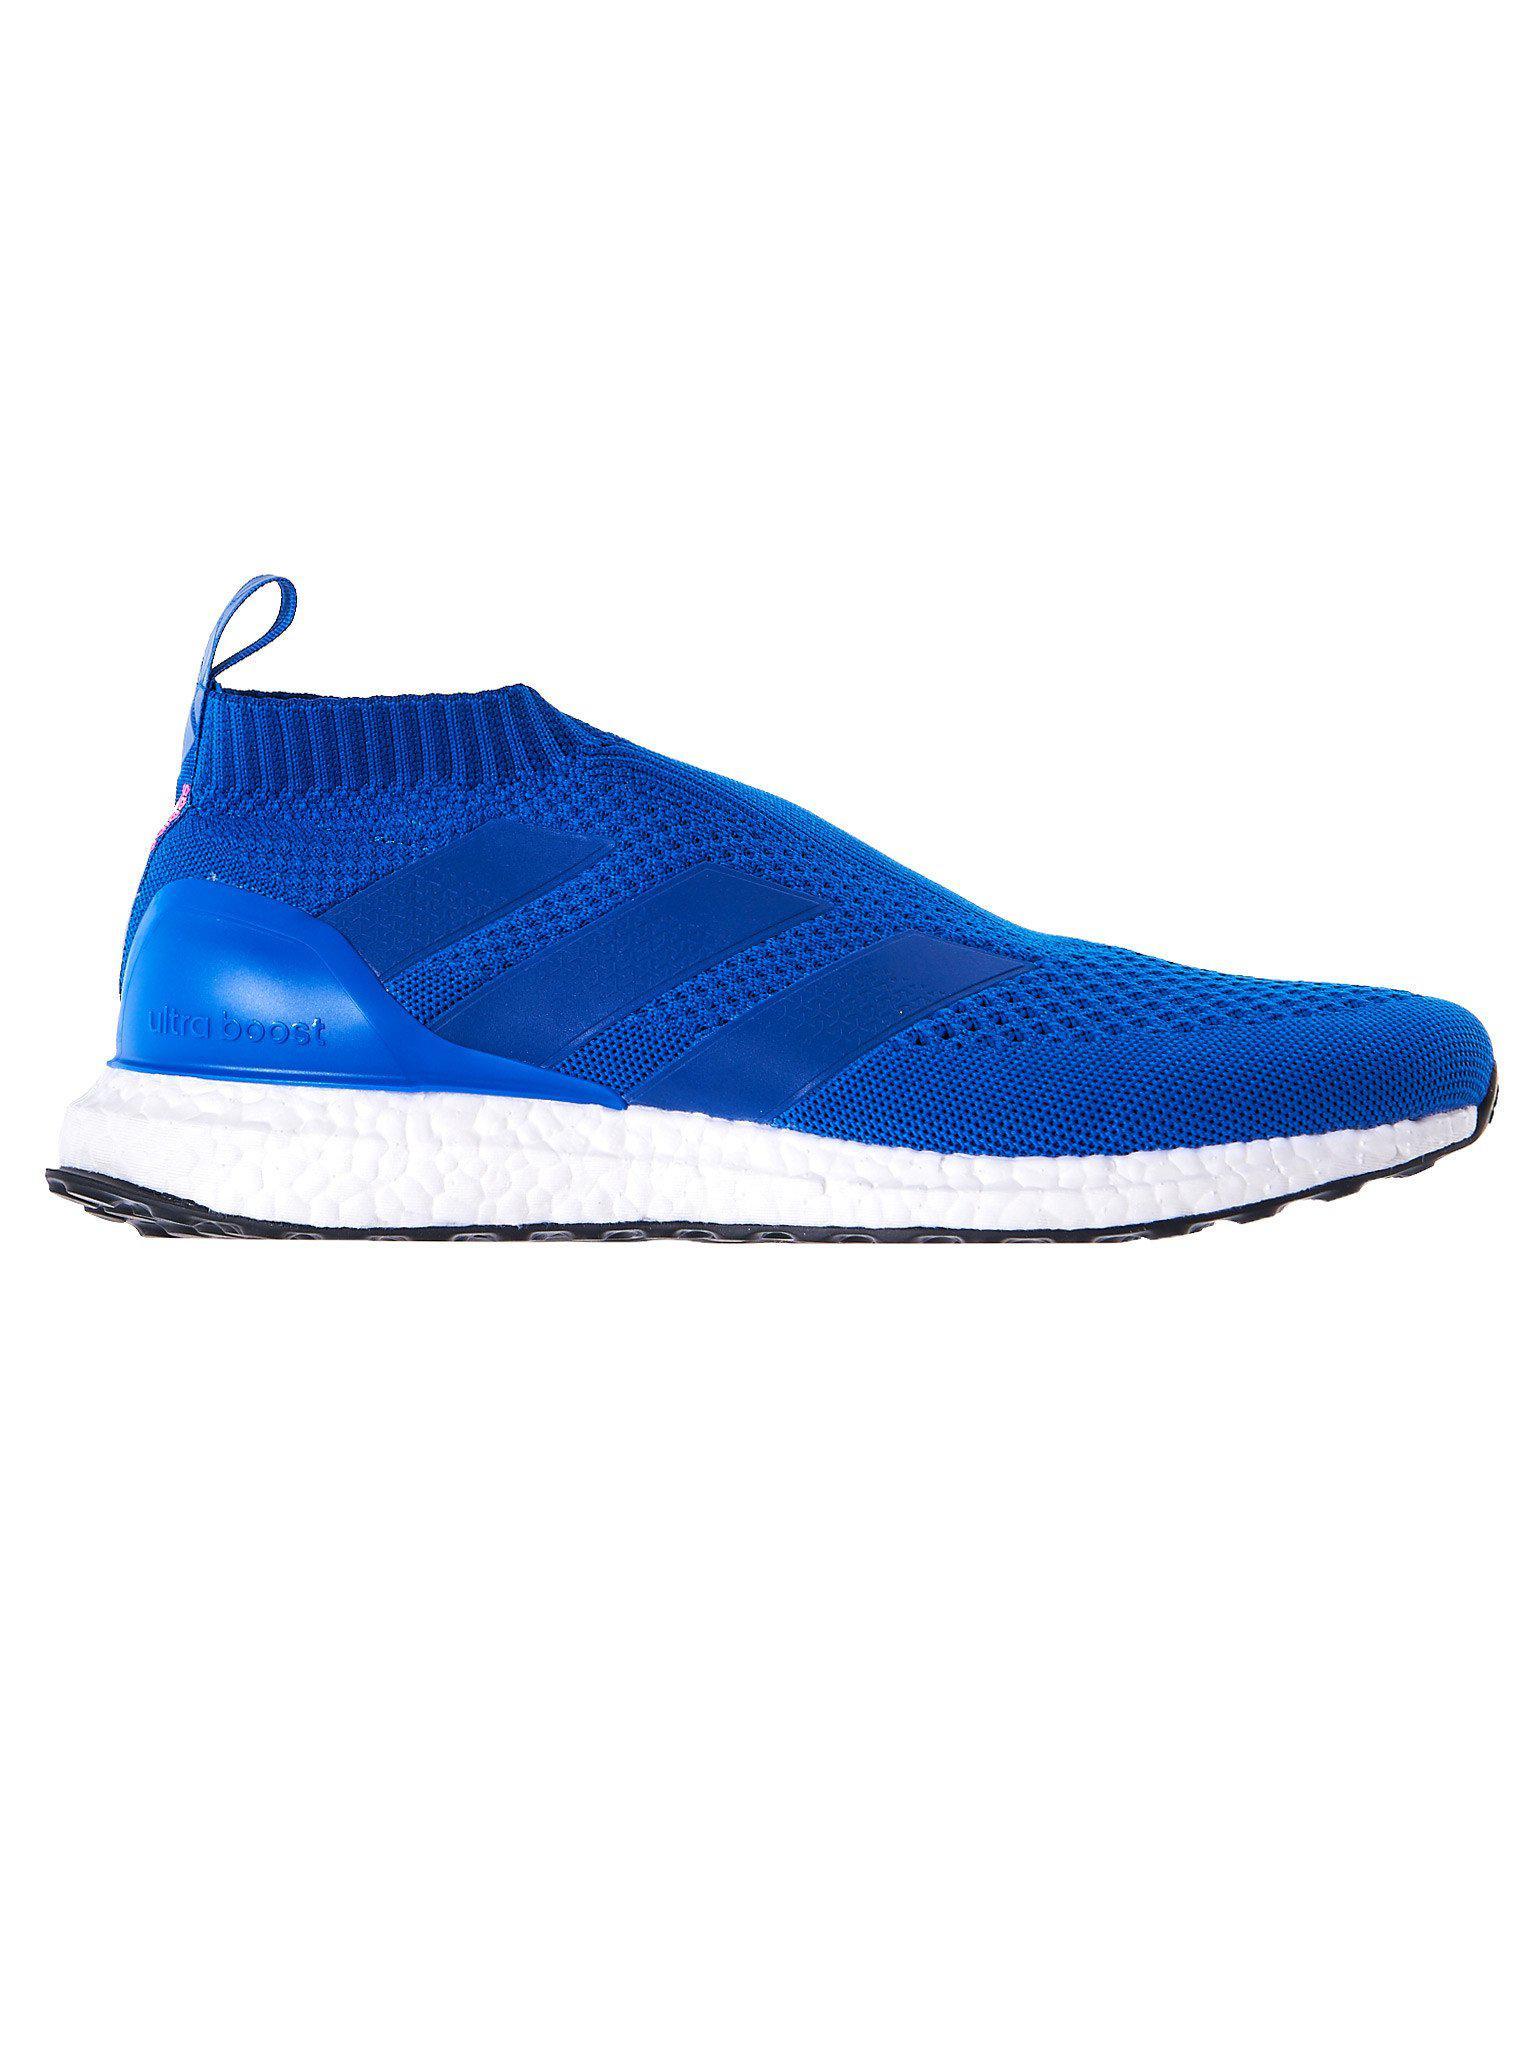 best sneakers ce791 e7500 Adidas Originals Blue Ace 17+ Purecontrol Ultra Boost for men